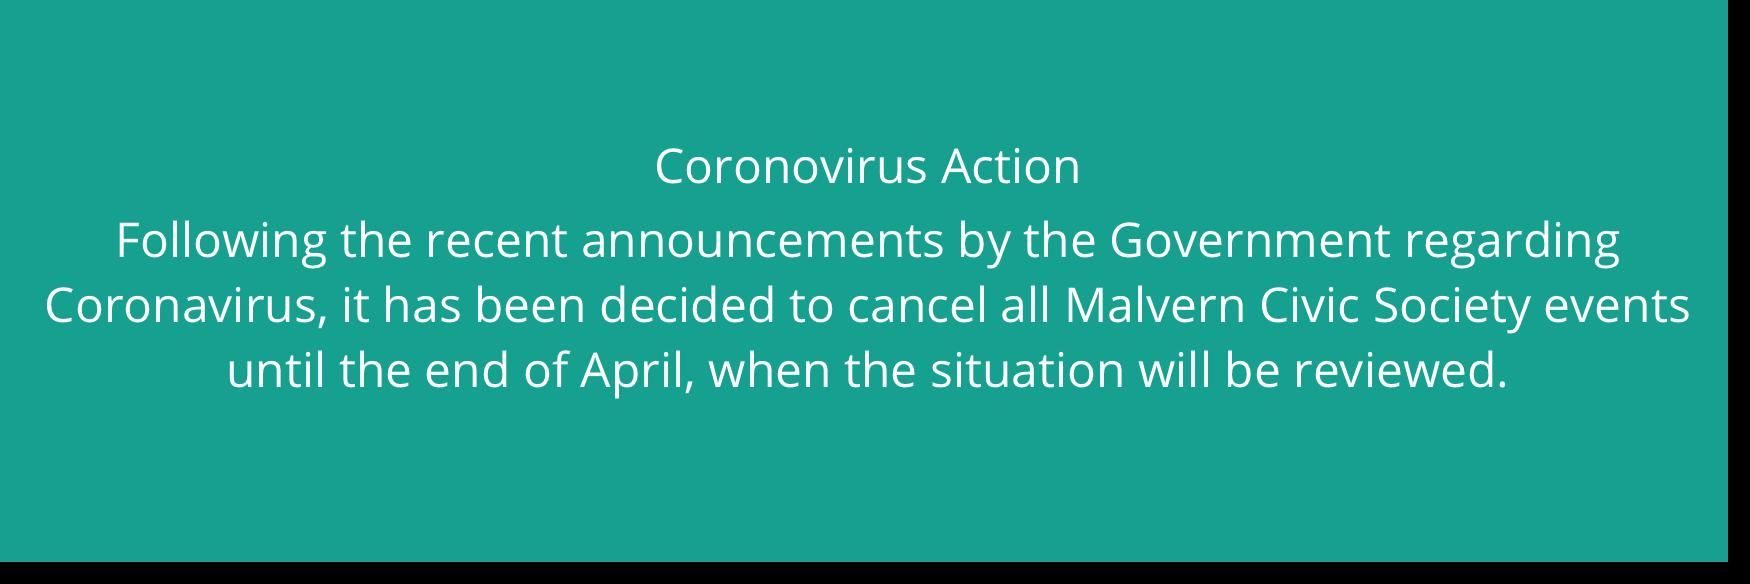 Coronovirus Action